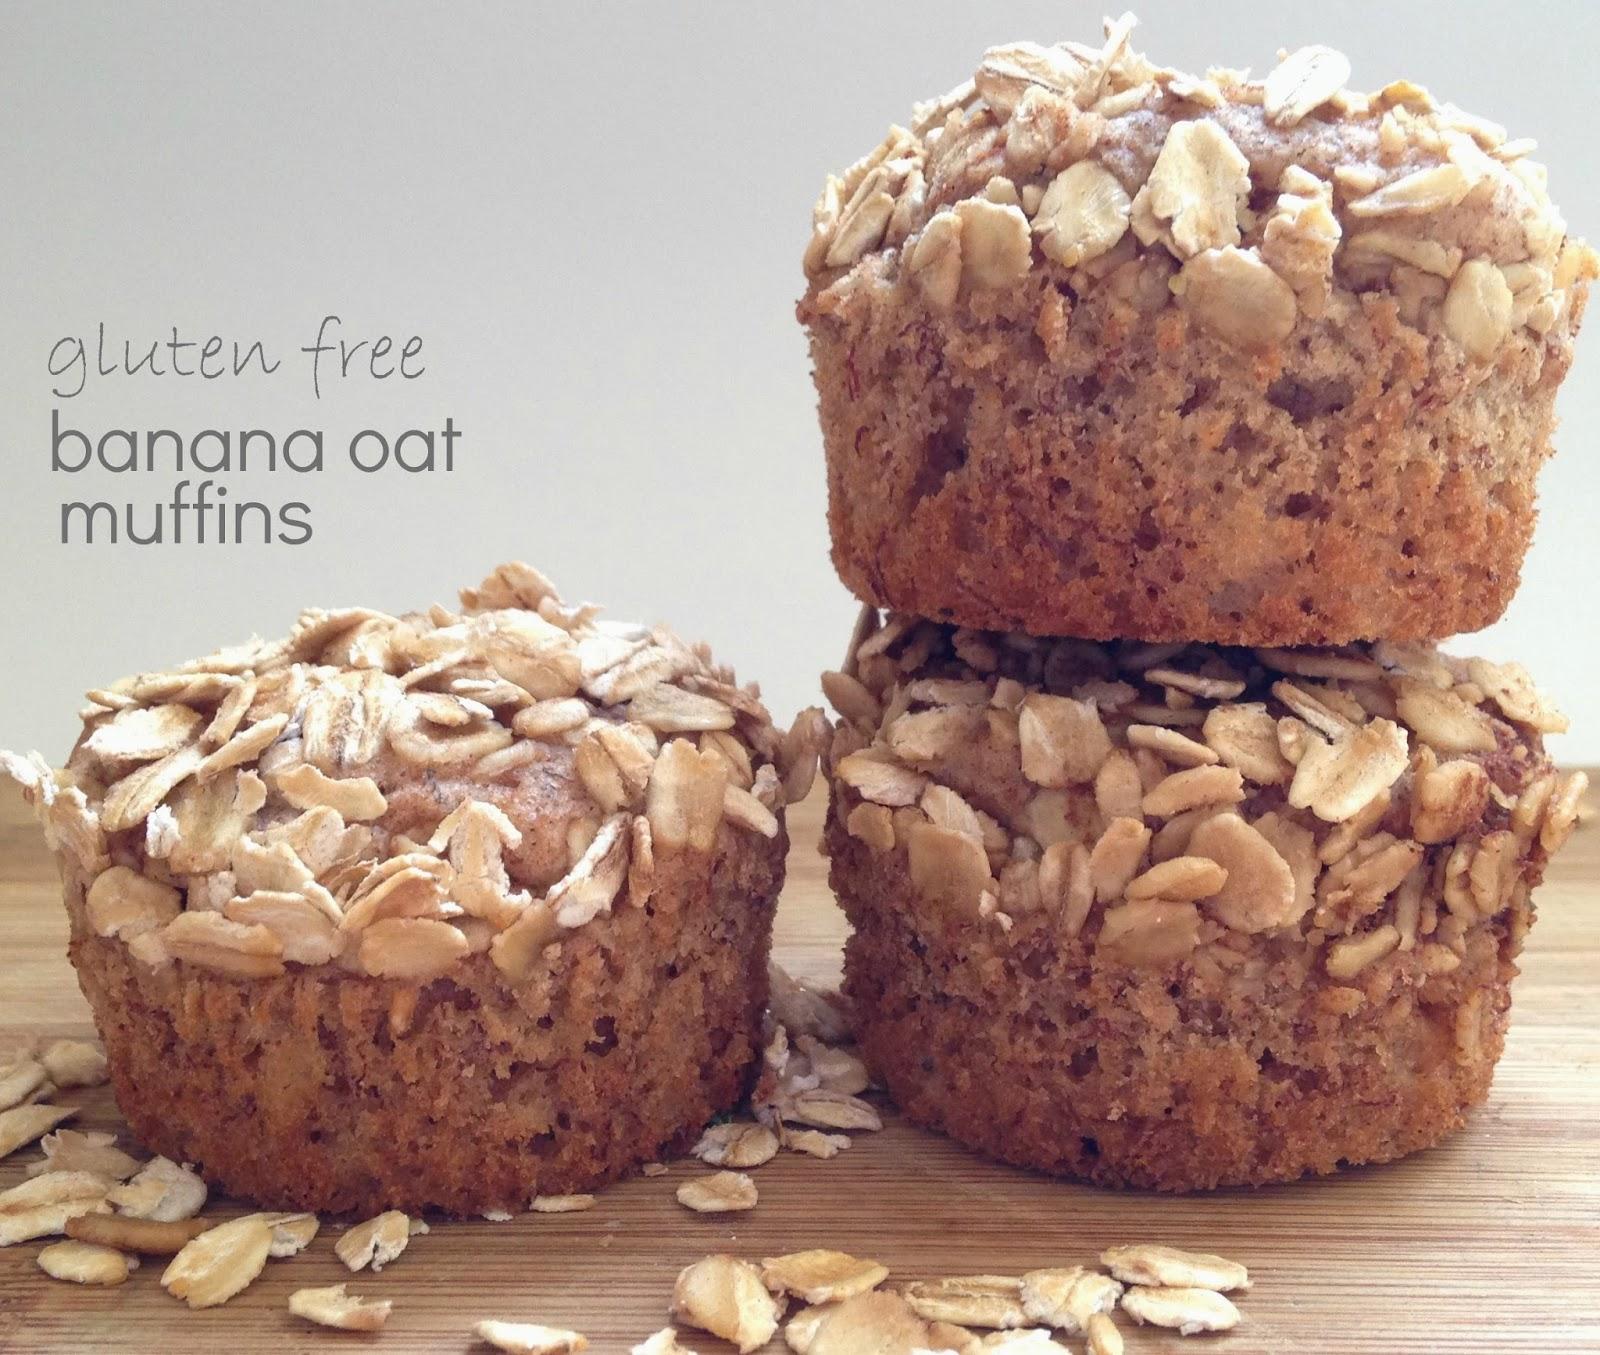 Baby Boy Bakery .: Gluten Free Banana Oat Muffins